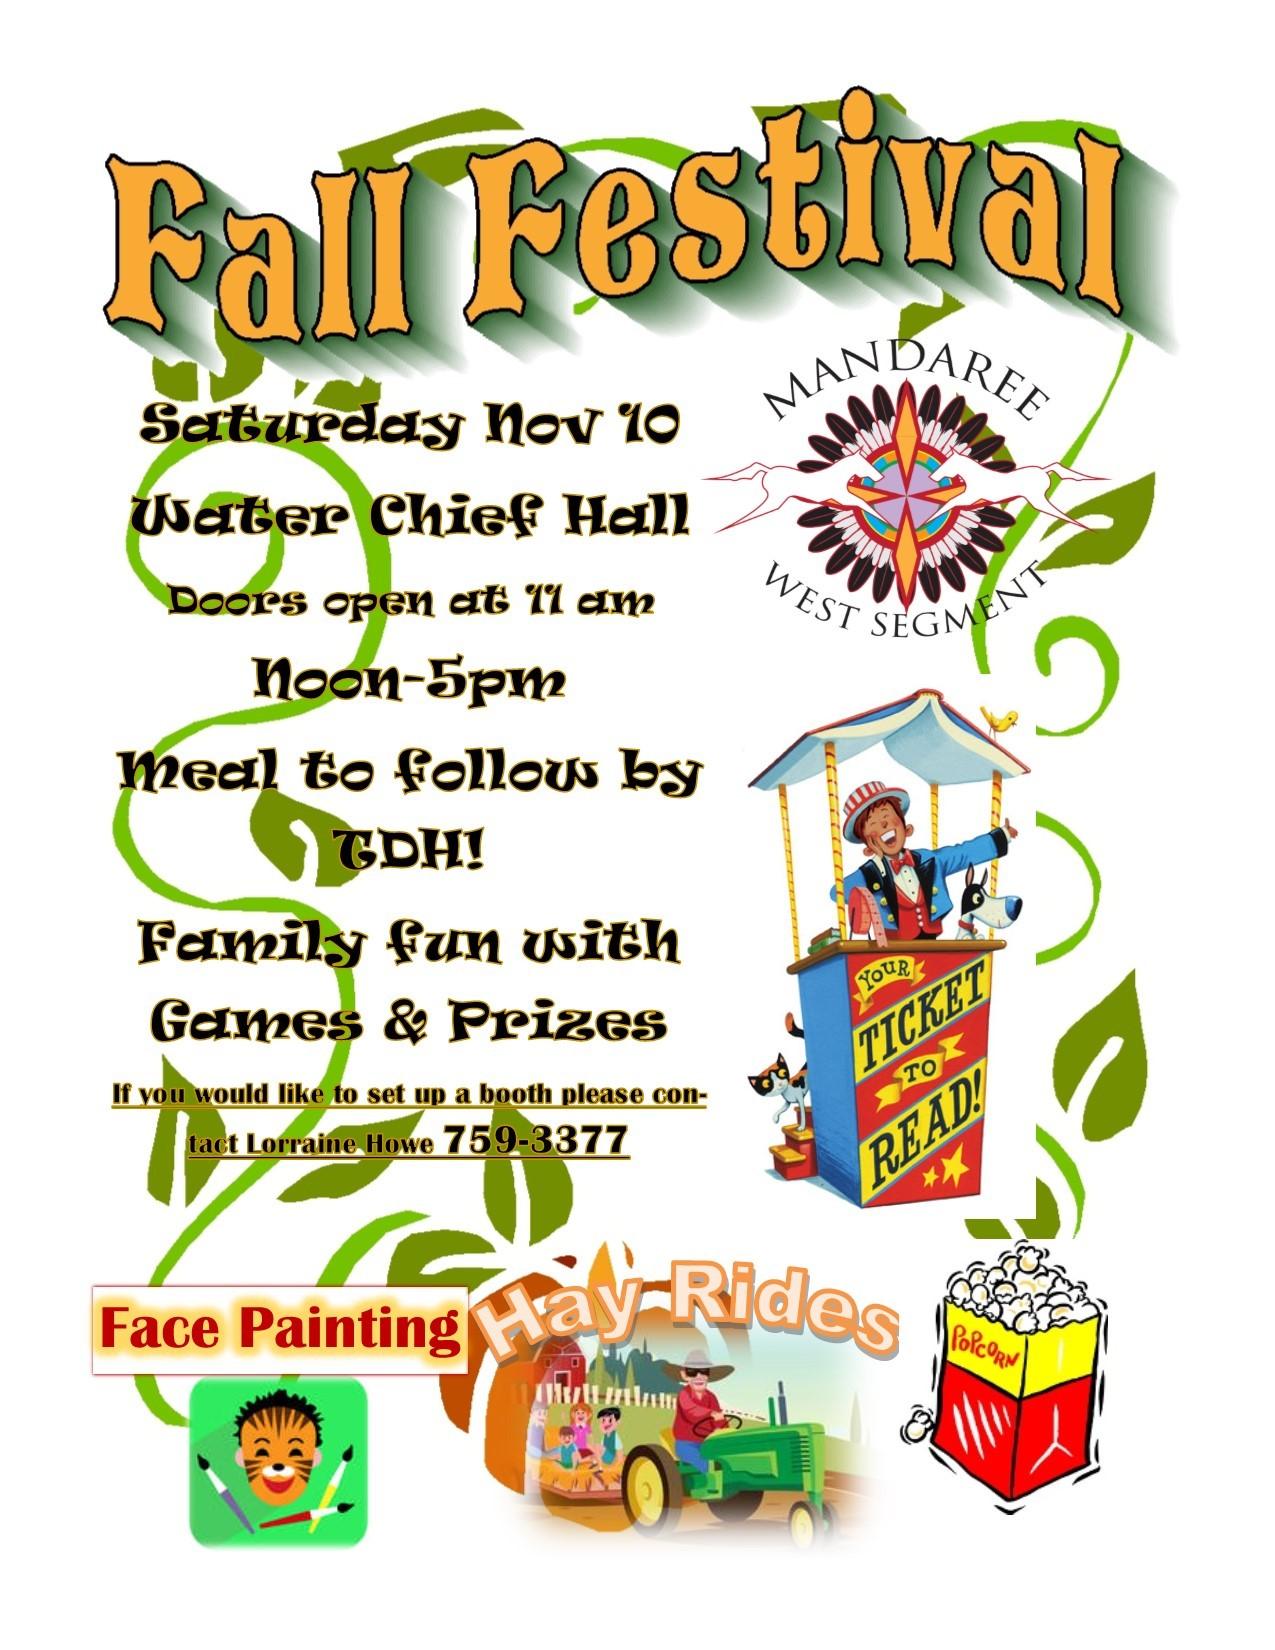 West Segment Fall Festival Nov 10.jpg